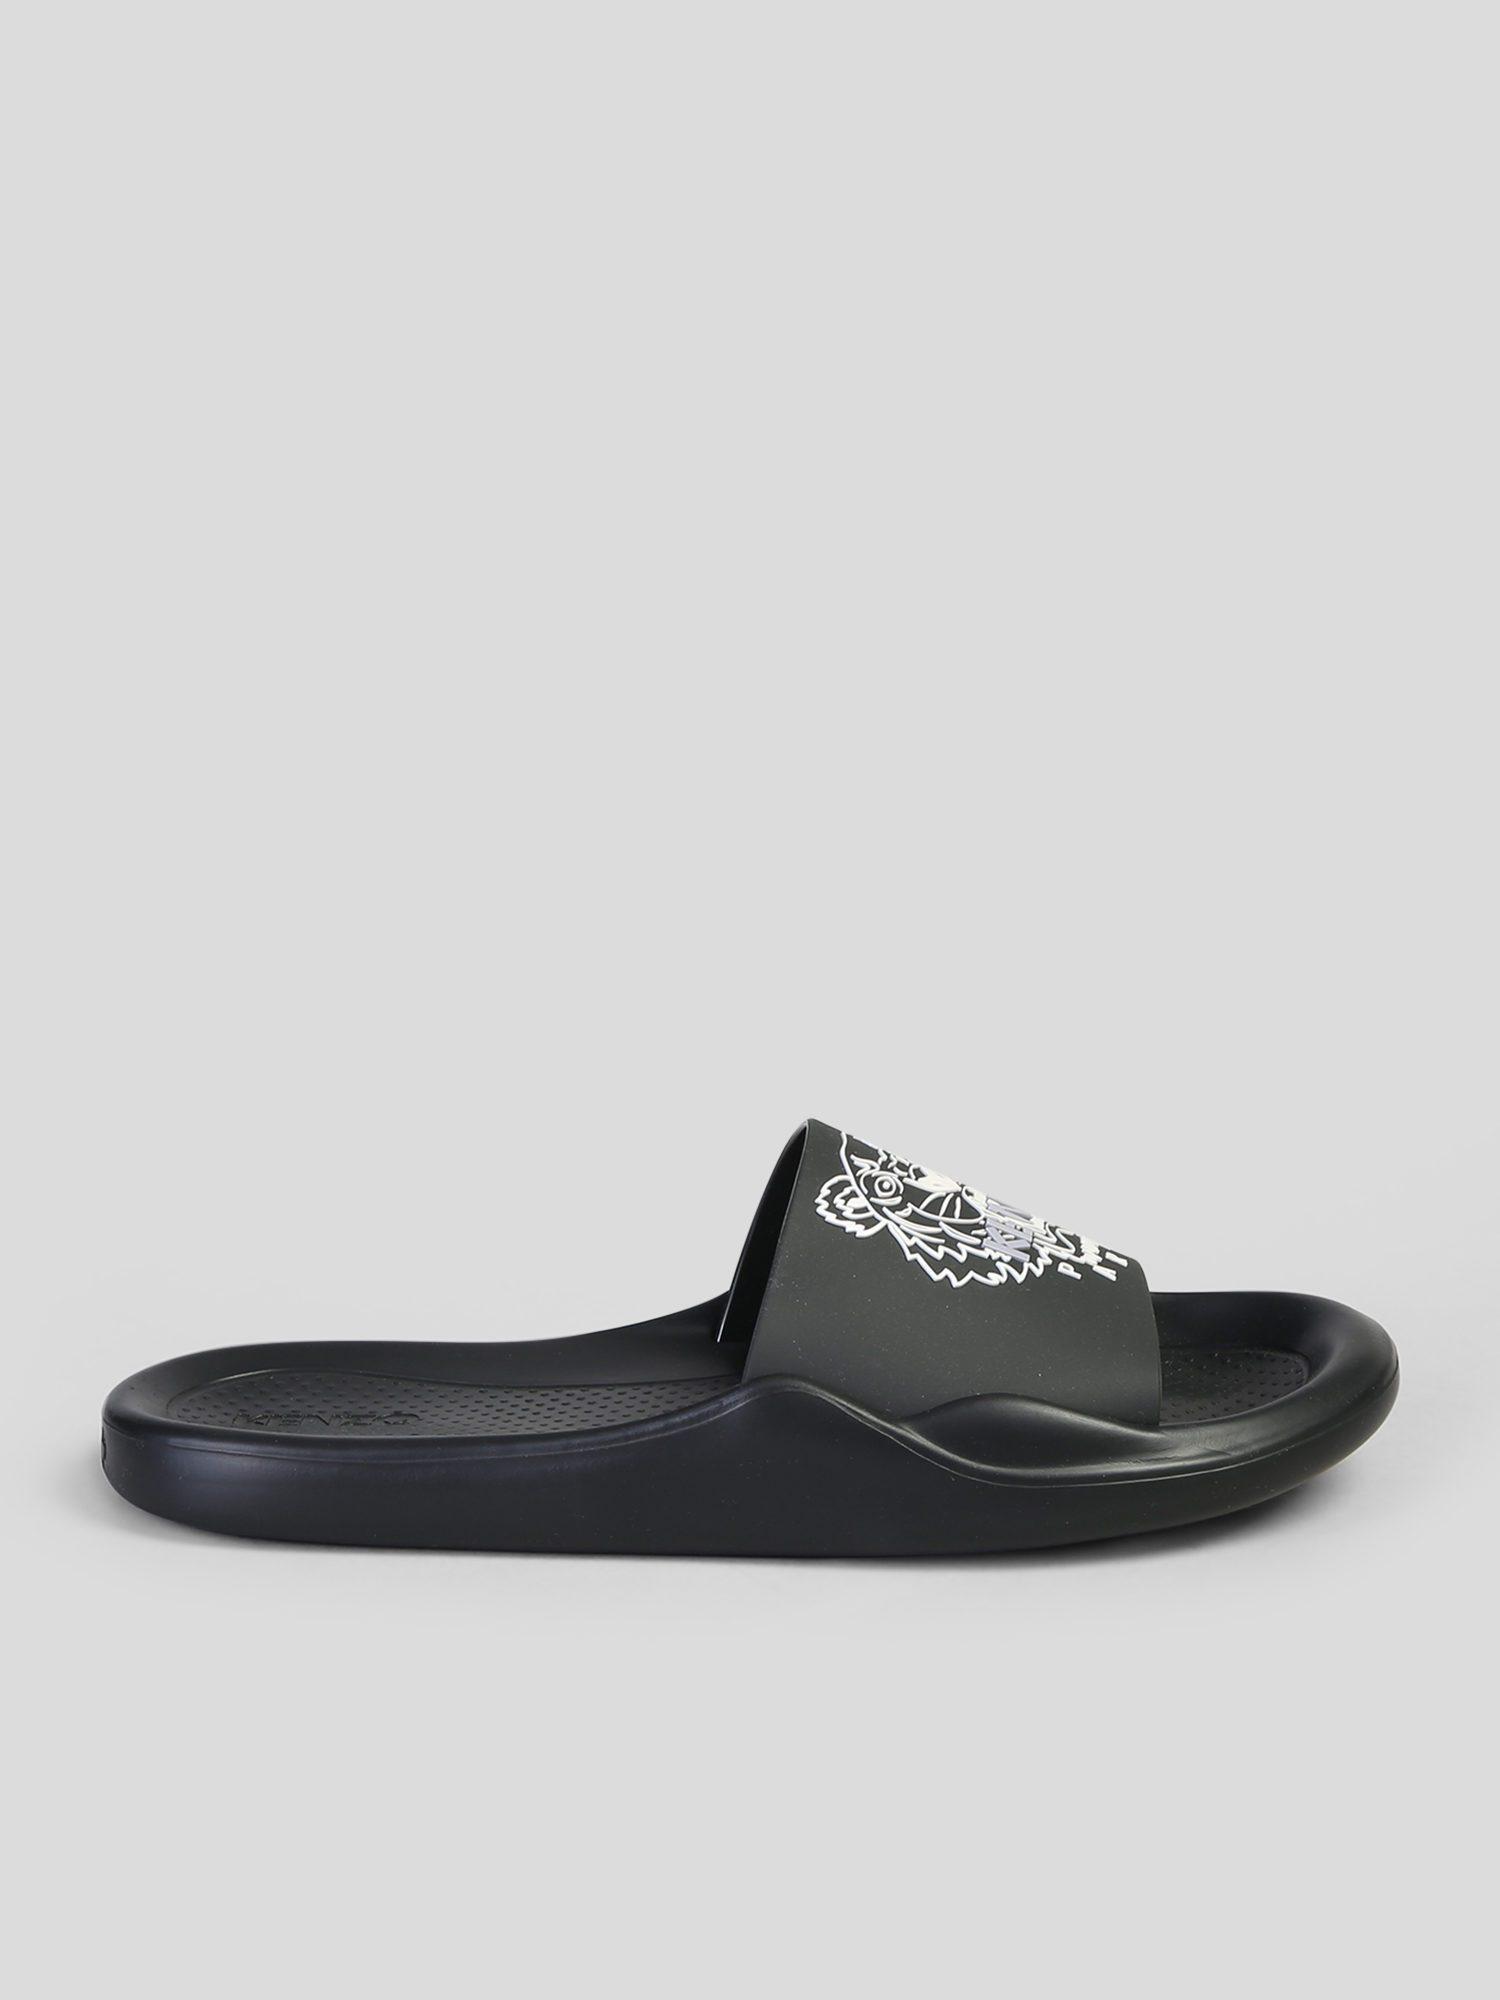 782933c50 Lyst - KENZO Tiger Pool Slide Sandals in Black